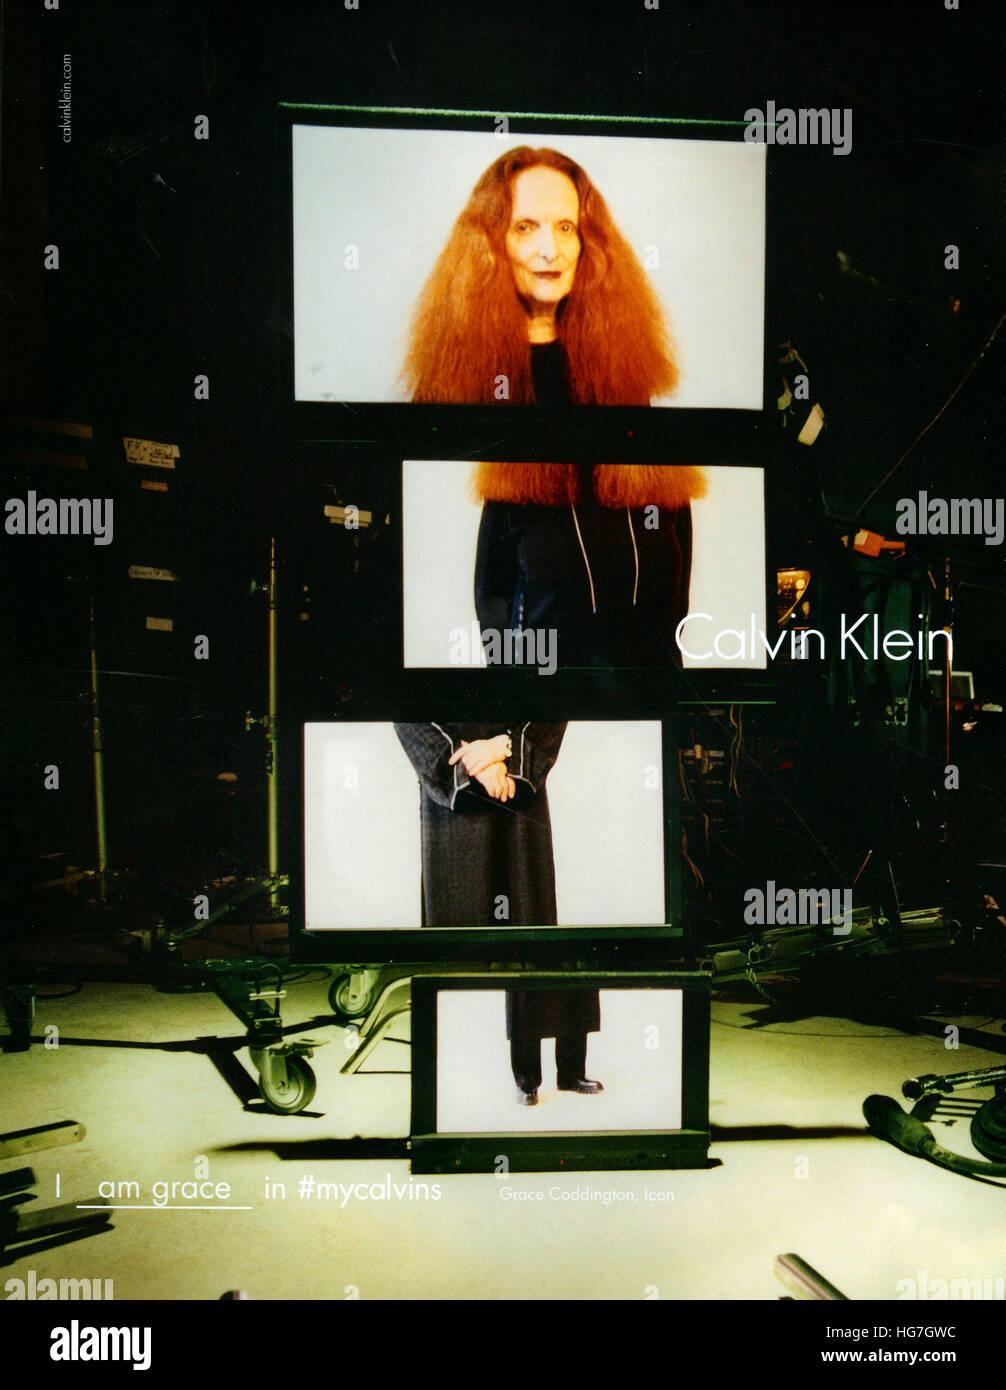 2010s UK Calvin Klein Magazine Advert - Stock Image